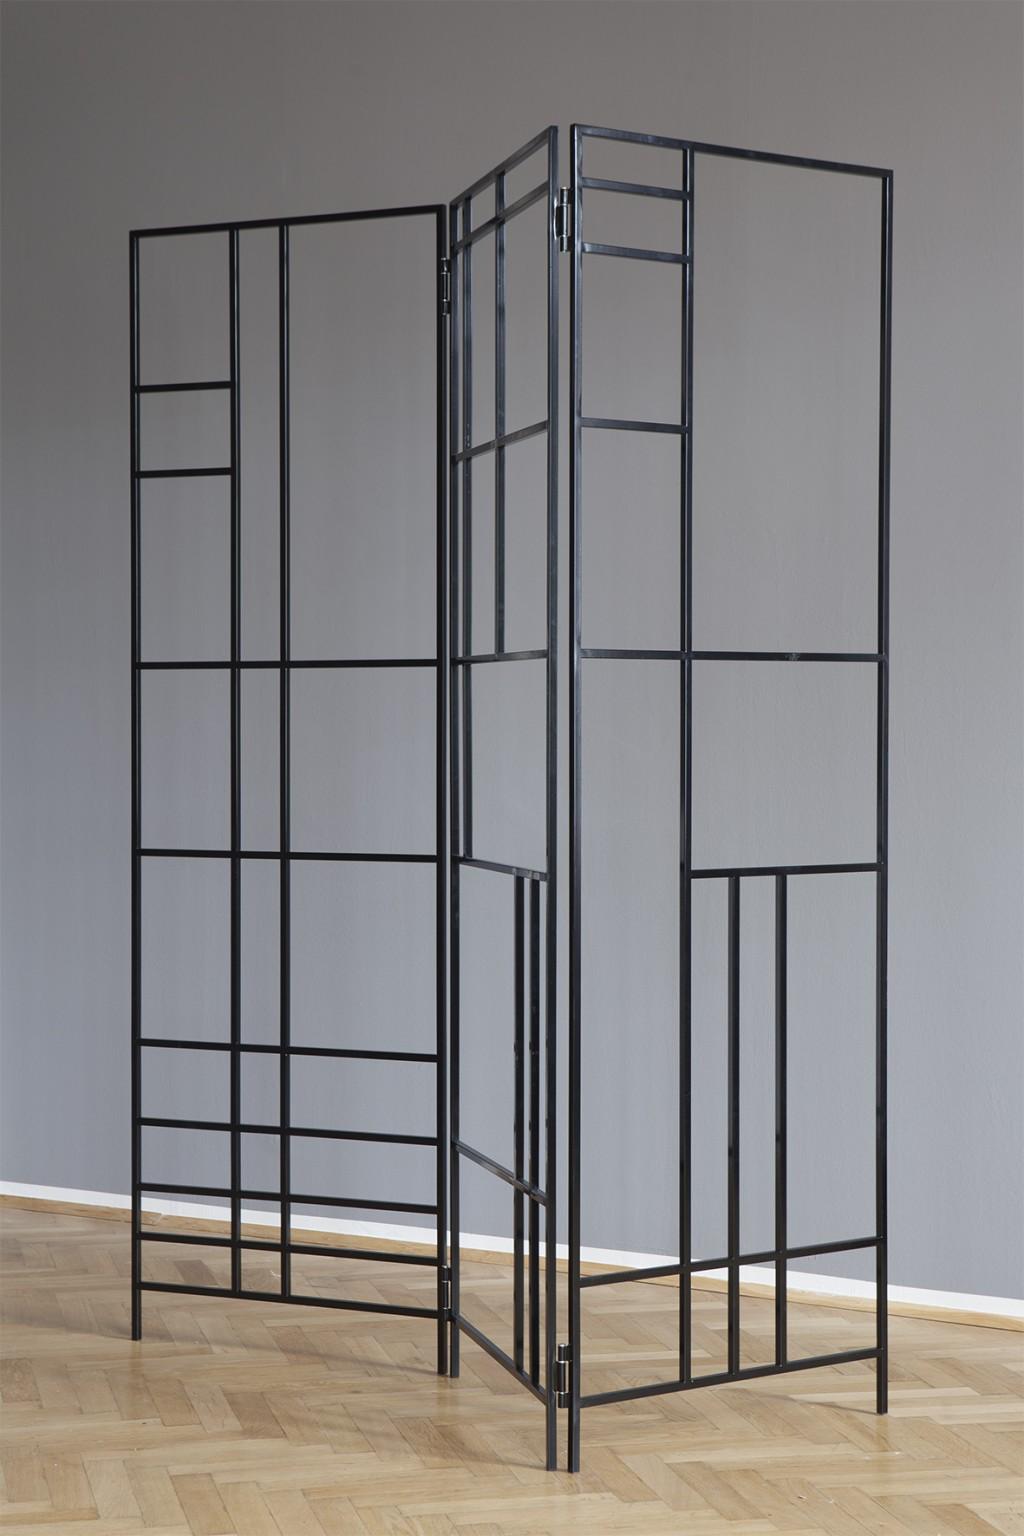 Metta / 210cm X 180cm X1,5 cm / 2016. Image Courtesy Galerie Nathalie Halgand, Photo: Julian Mullan